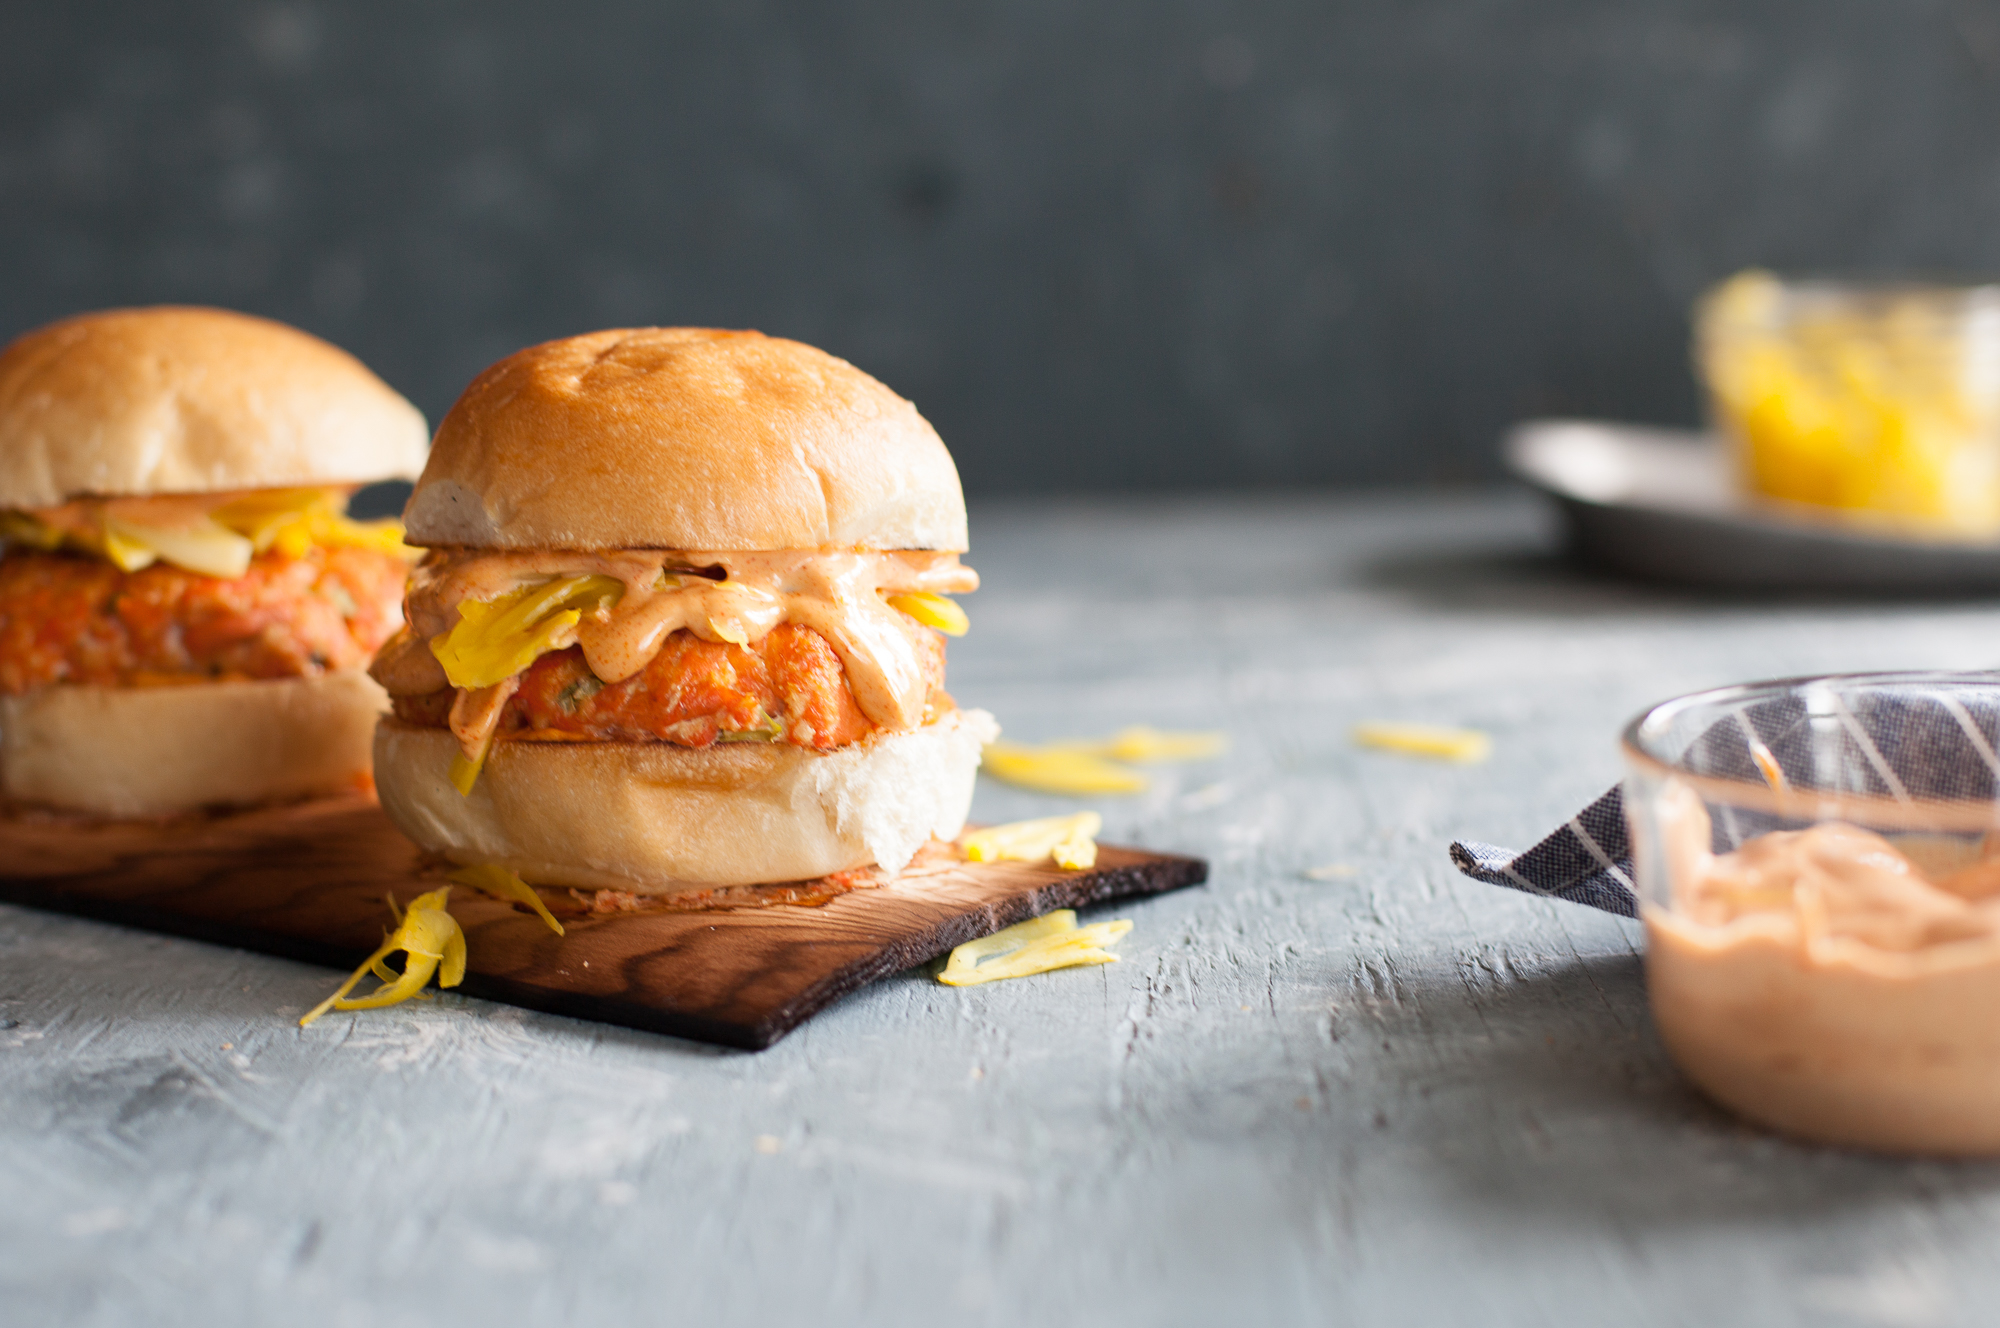 Grilling Dinner Idea: Cedar Planked Salmon Burger with Saffron Pickled Fennel